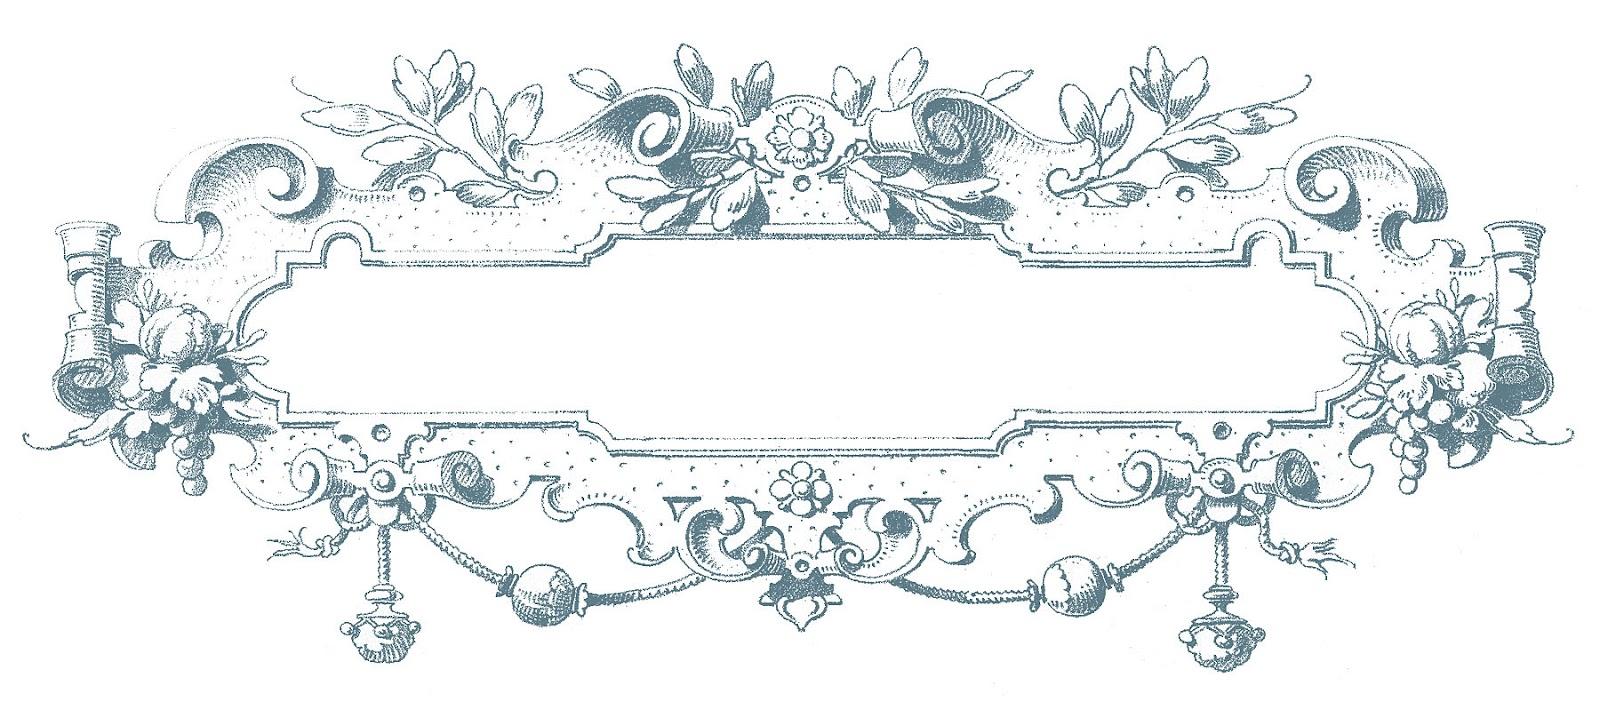 Victorian clipart color png transparent library Vintage Clip Art - Gorgeous Ornate Frames - The Graphics Fairy png transparent library